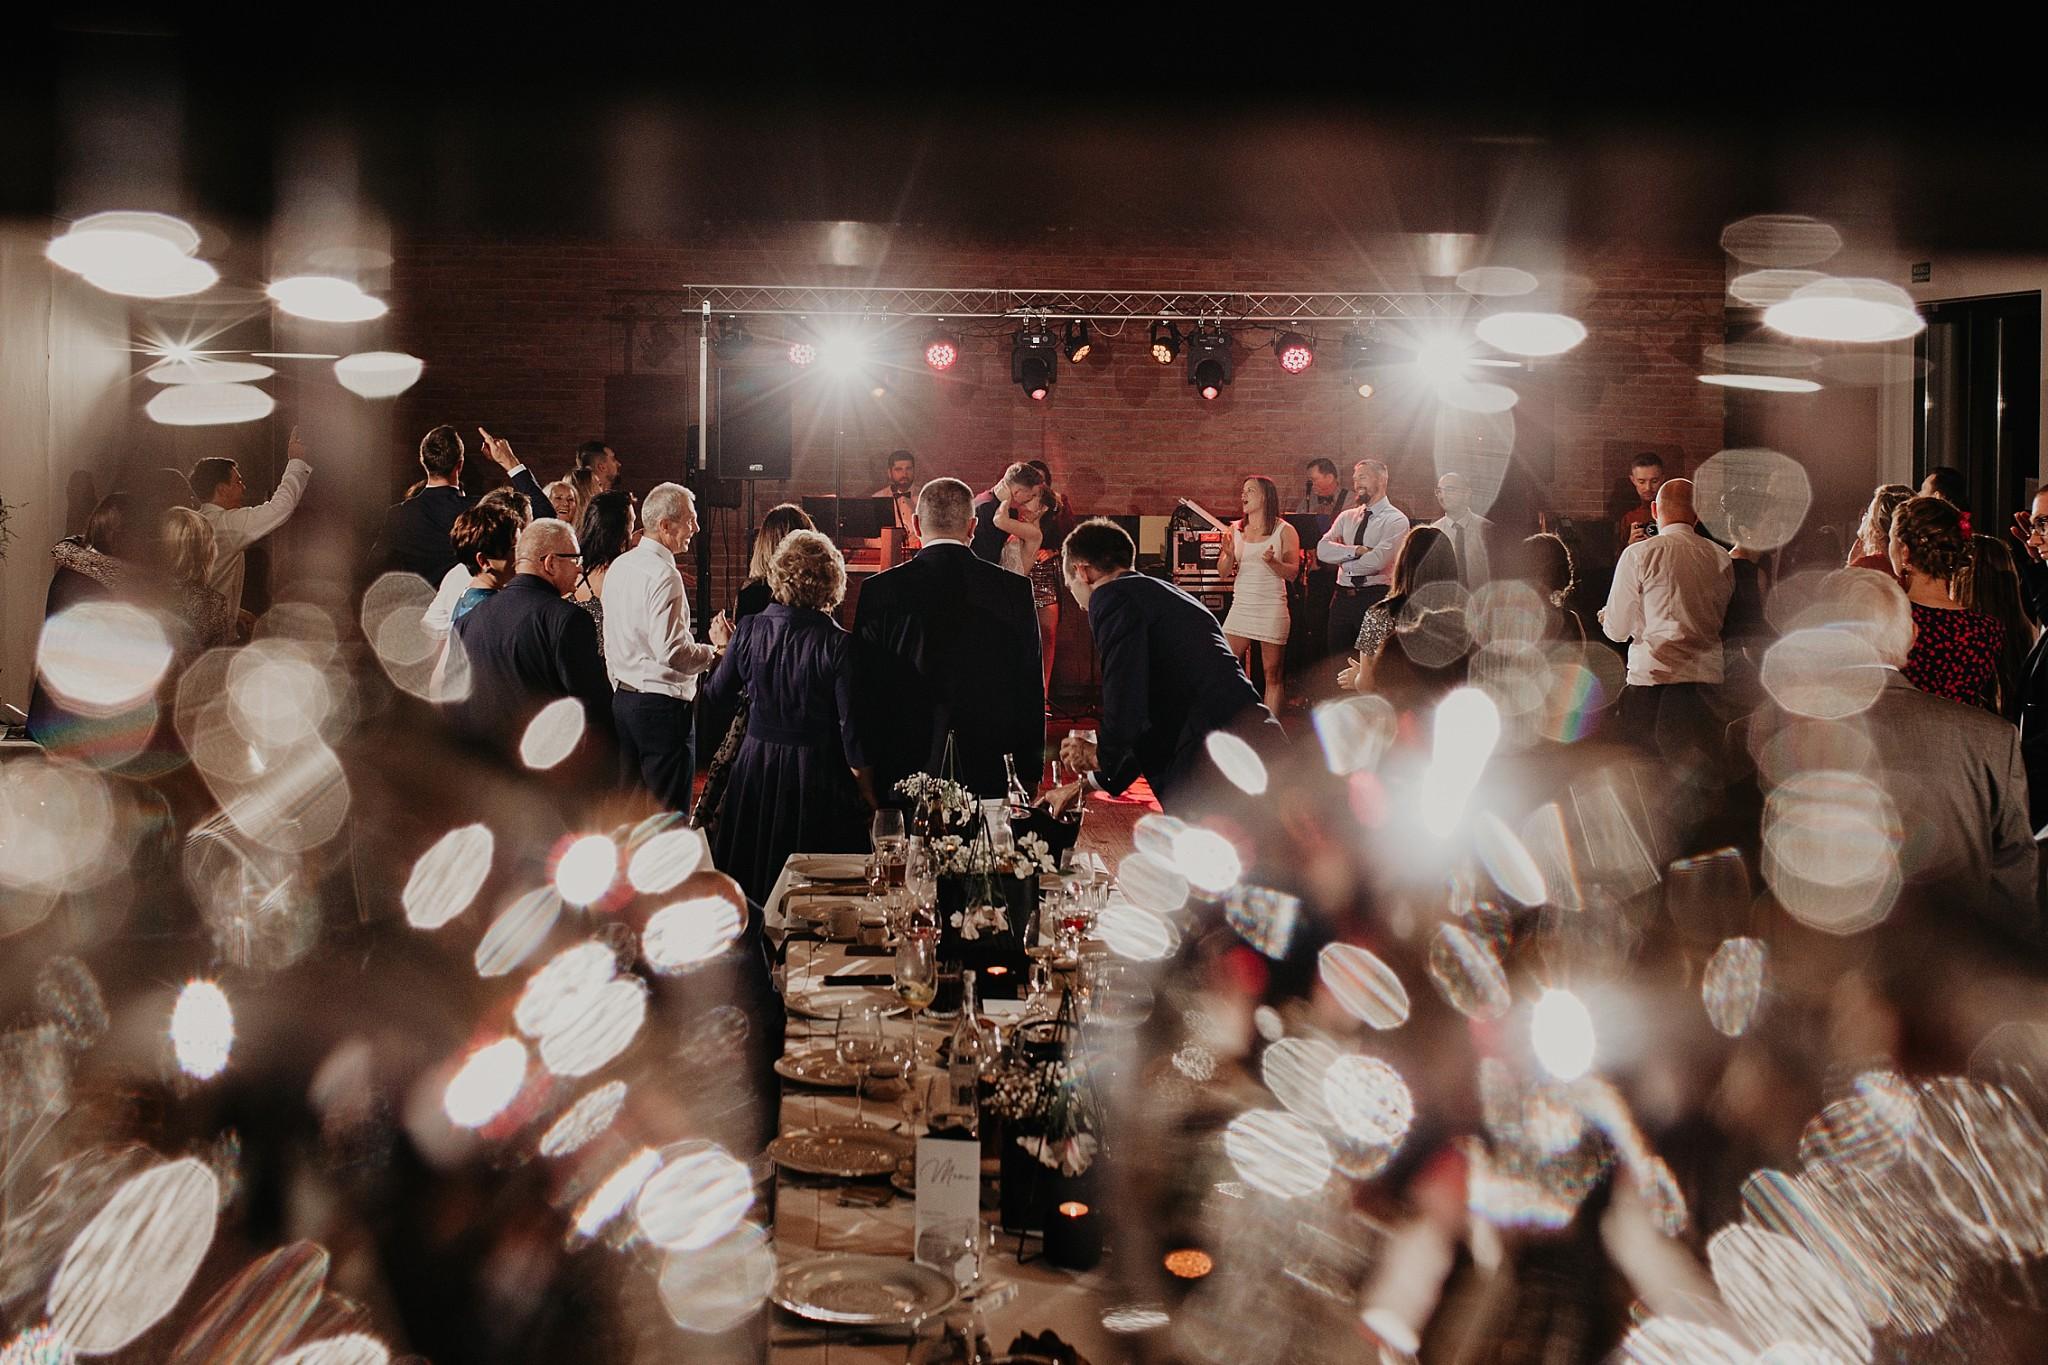 fotograf poznan wesele dobra truskawka piekne wesele pod poznaniem wesele w dobrej truskawce piekna para mloda slub marzen slub koronawirus slub listopad wesele koronawirus 423